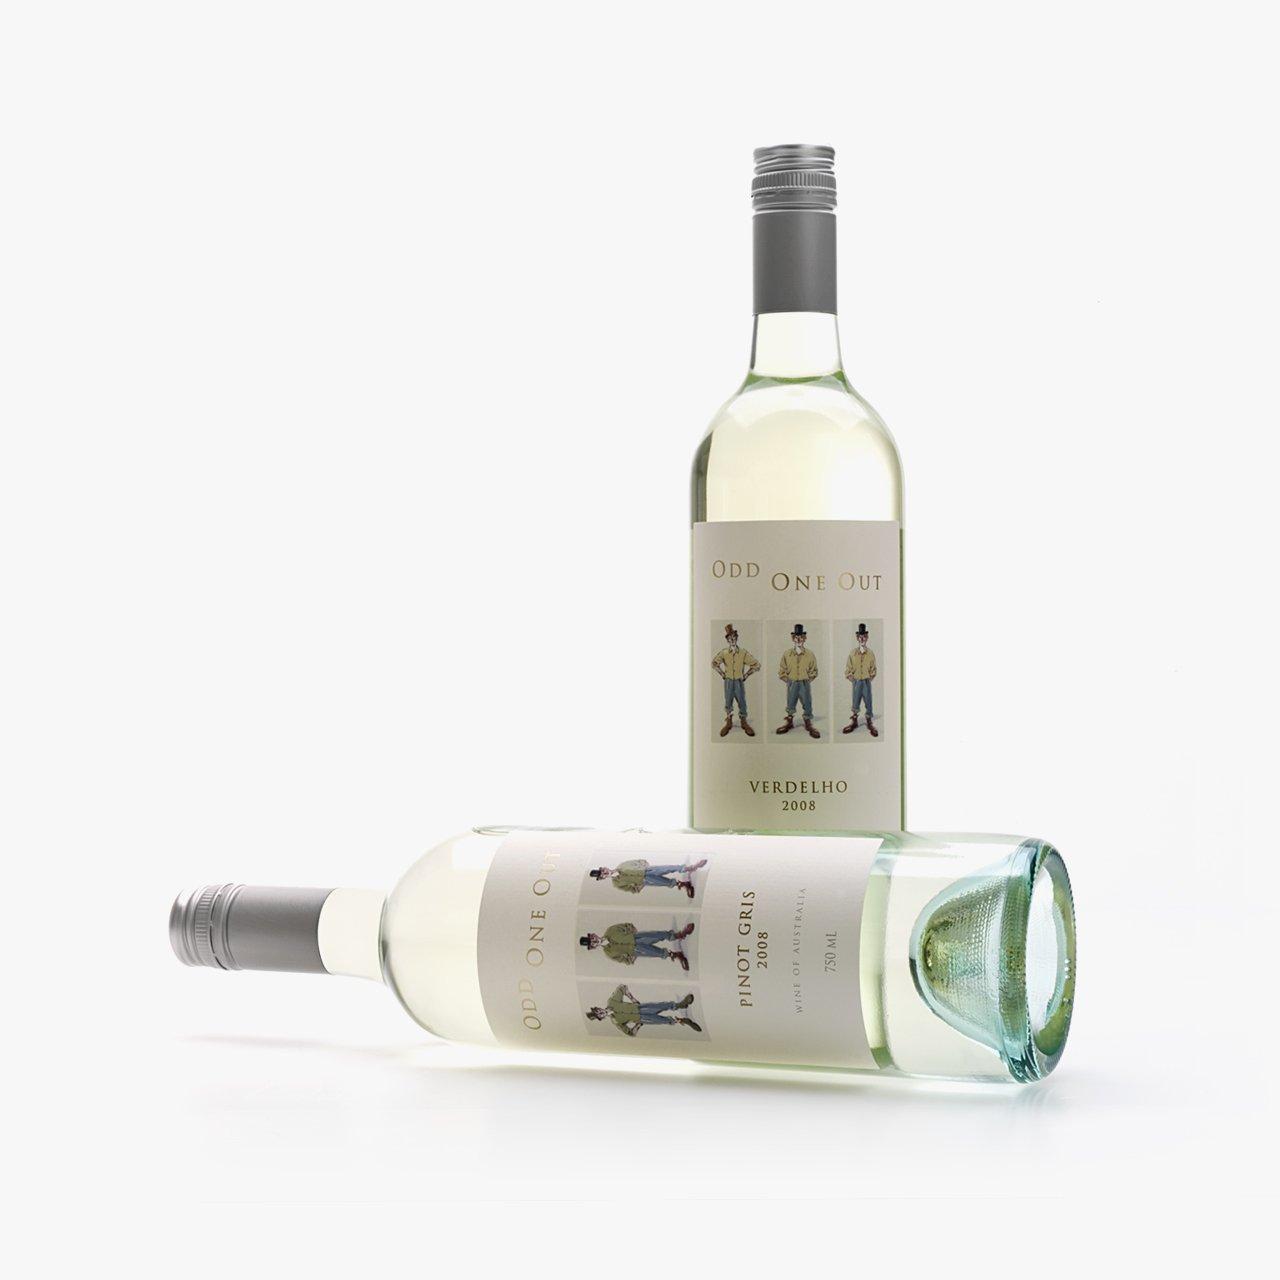 wine illustration OddOneOut bottles